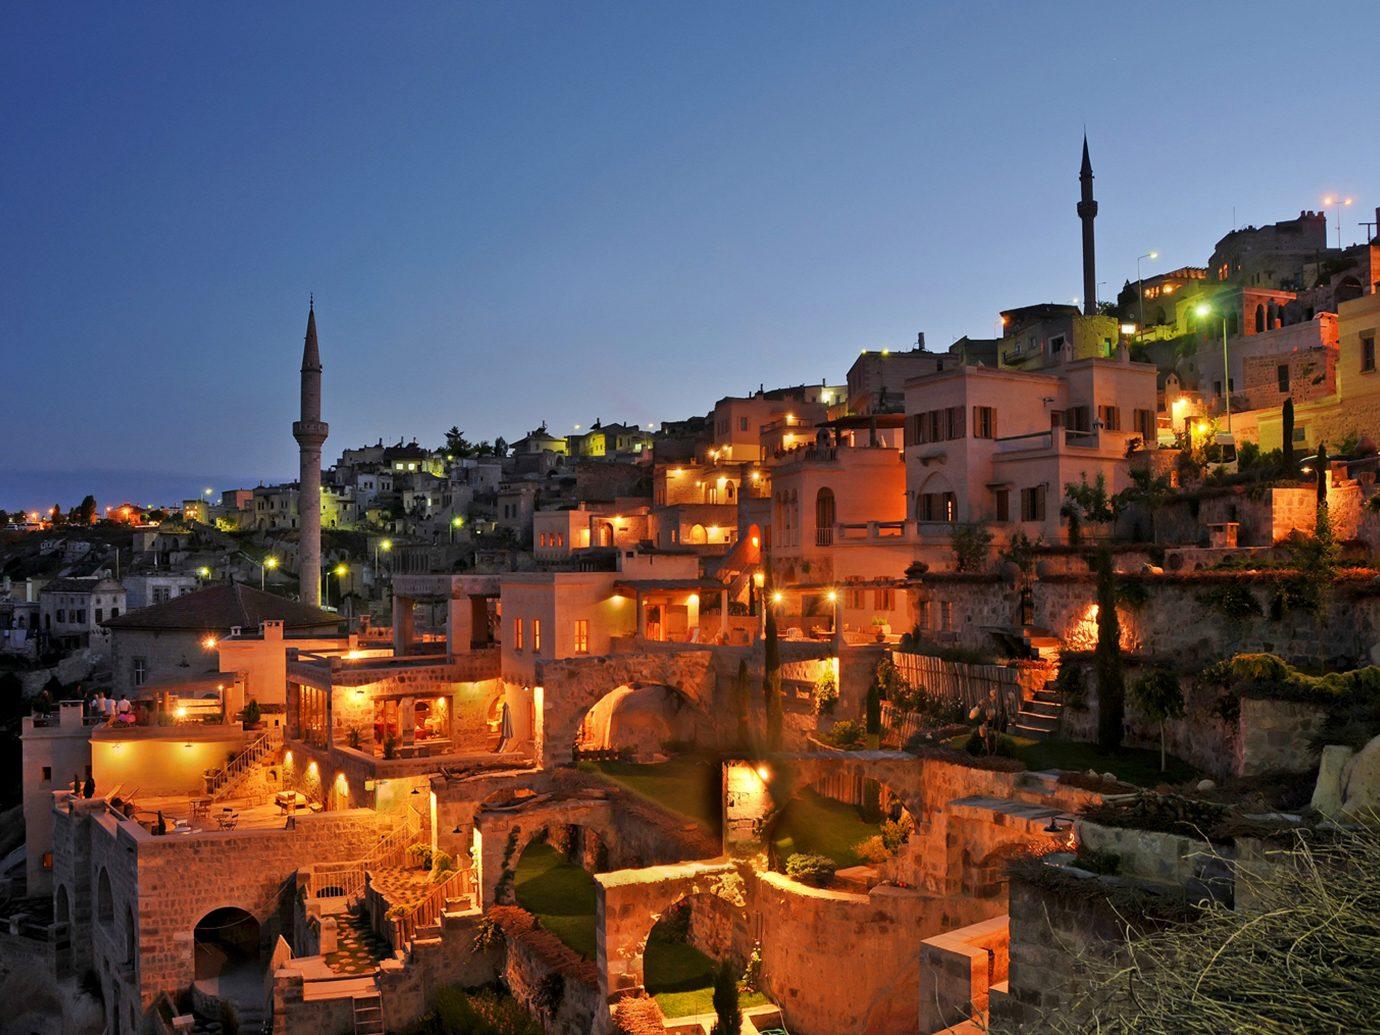 Argos in Cappadocia night shot with lit up buildings